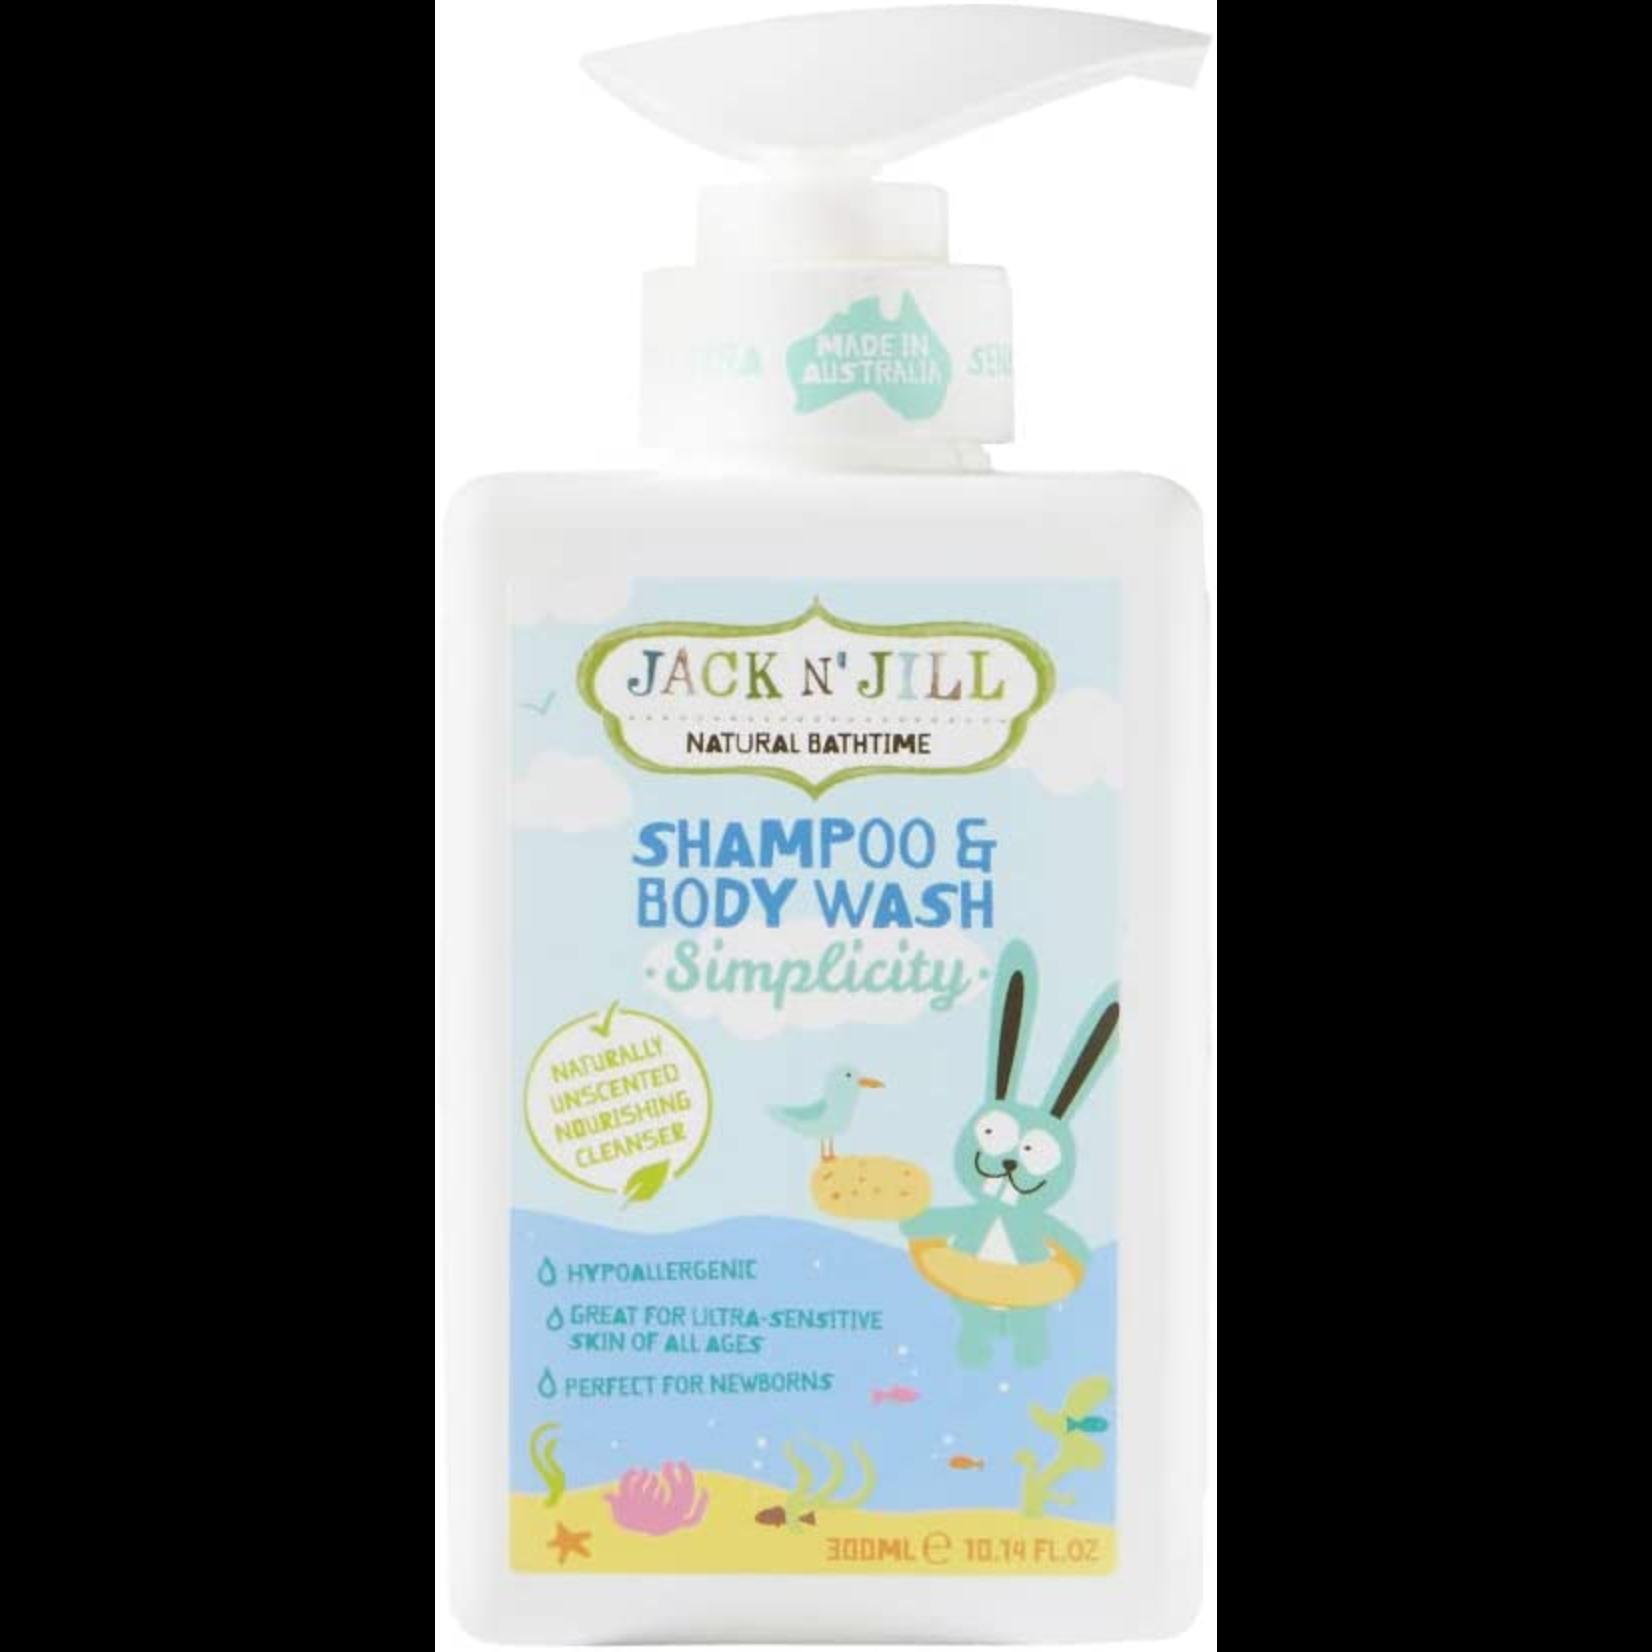 Jack N' Jill Jack N' Jill Shampoo/Body Wash Simplicity